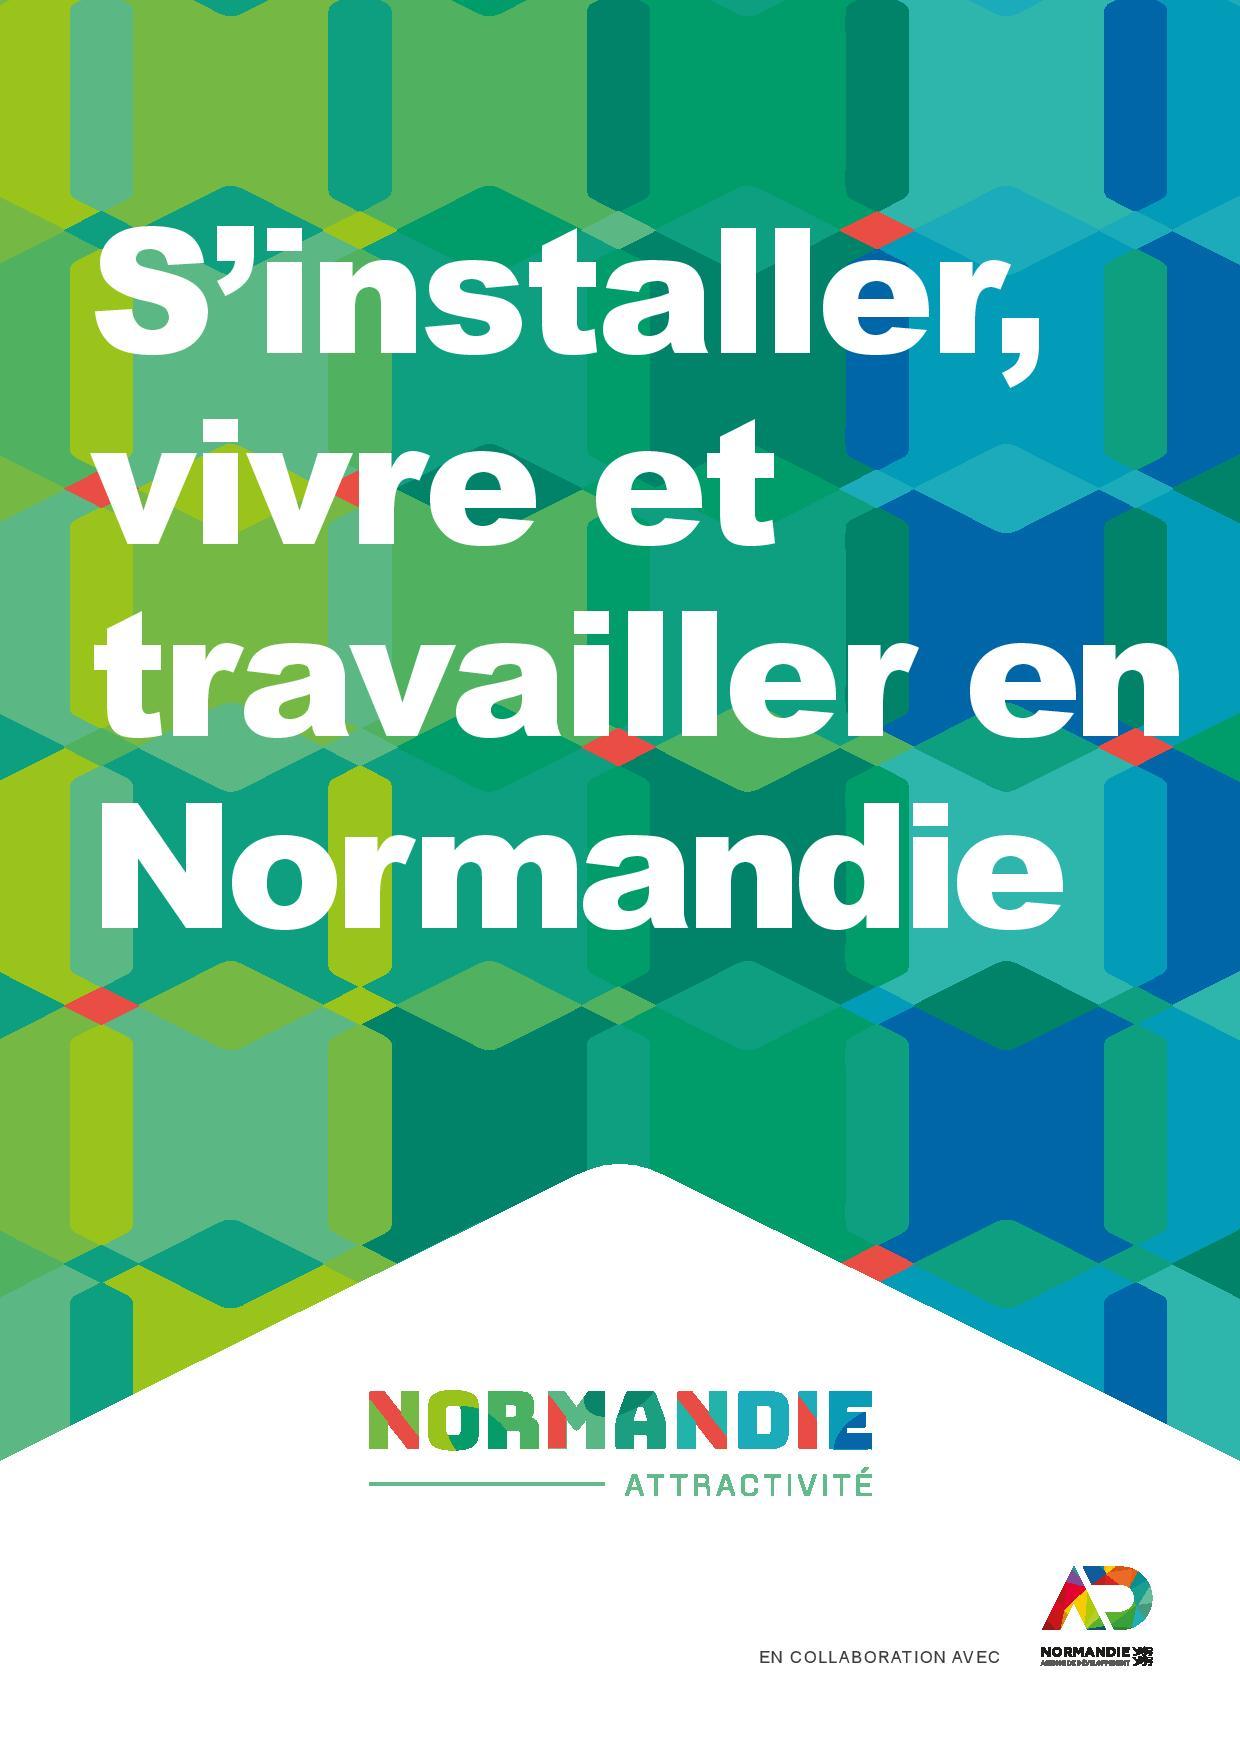 S'installer, vivre et travailler en Normandie : clap de fin !